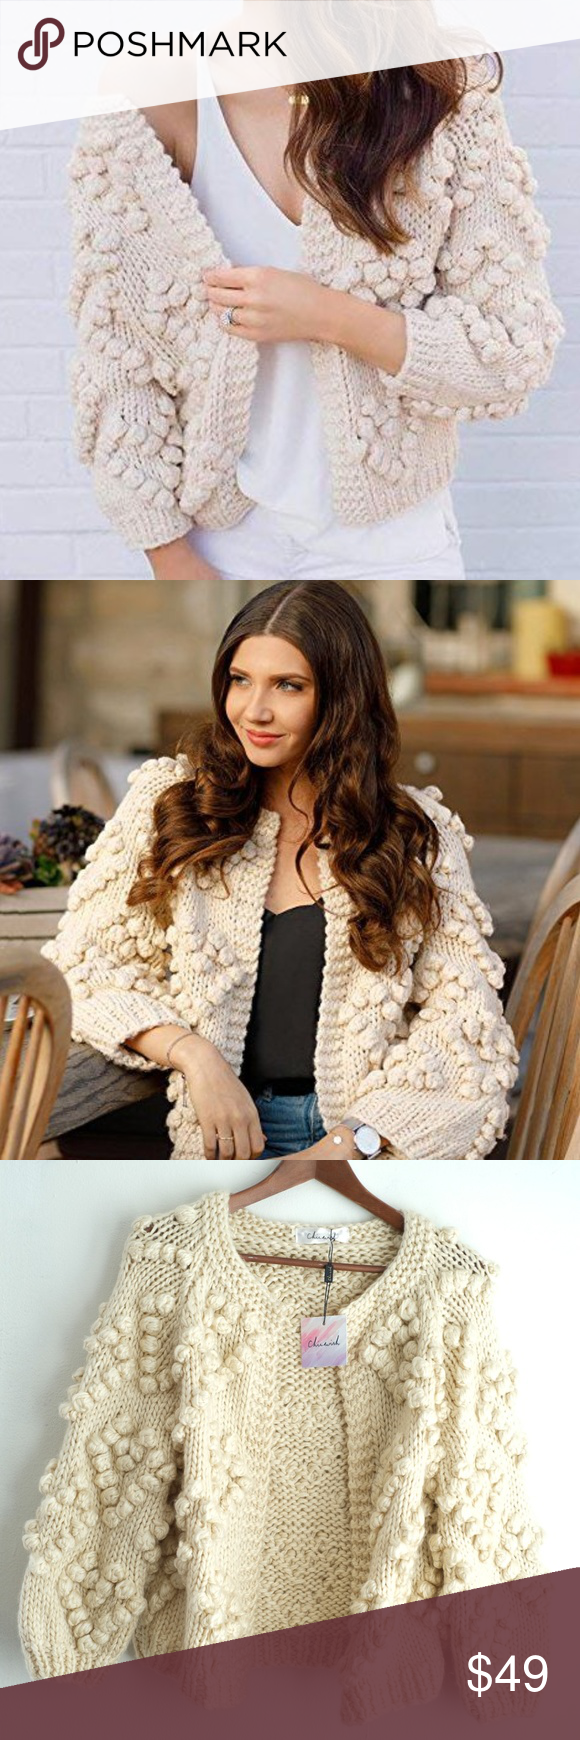 Chicwish Heart Shape Balls Cardigan Ball Trim Sweaters For Women Casual Looks